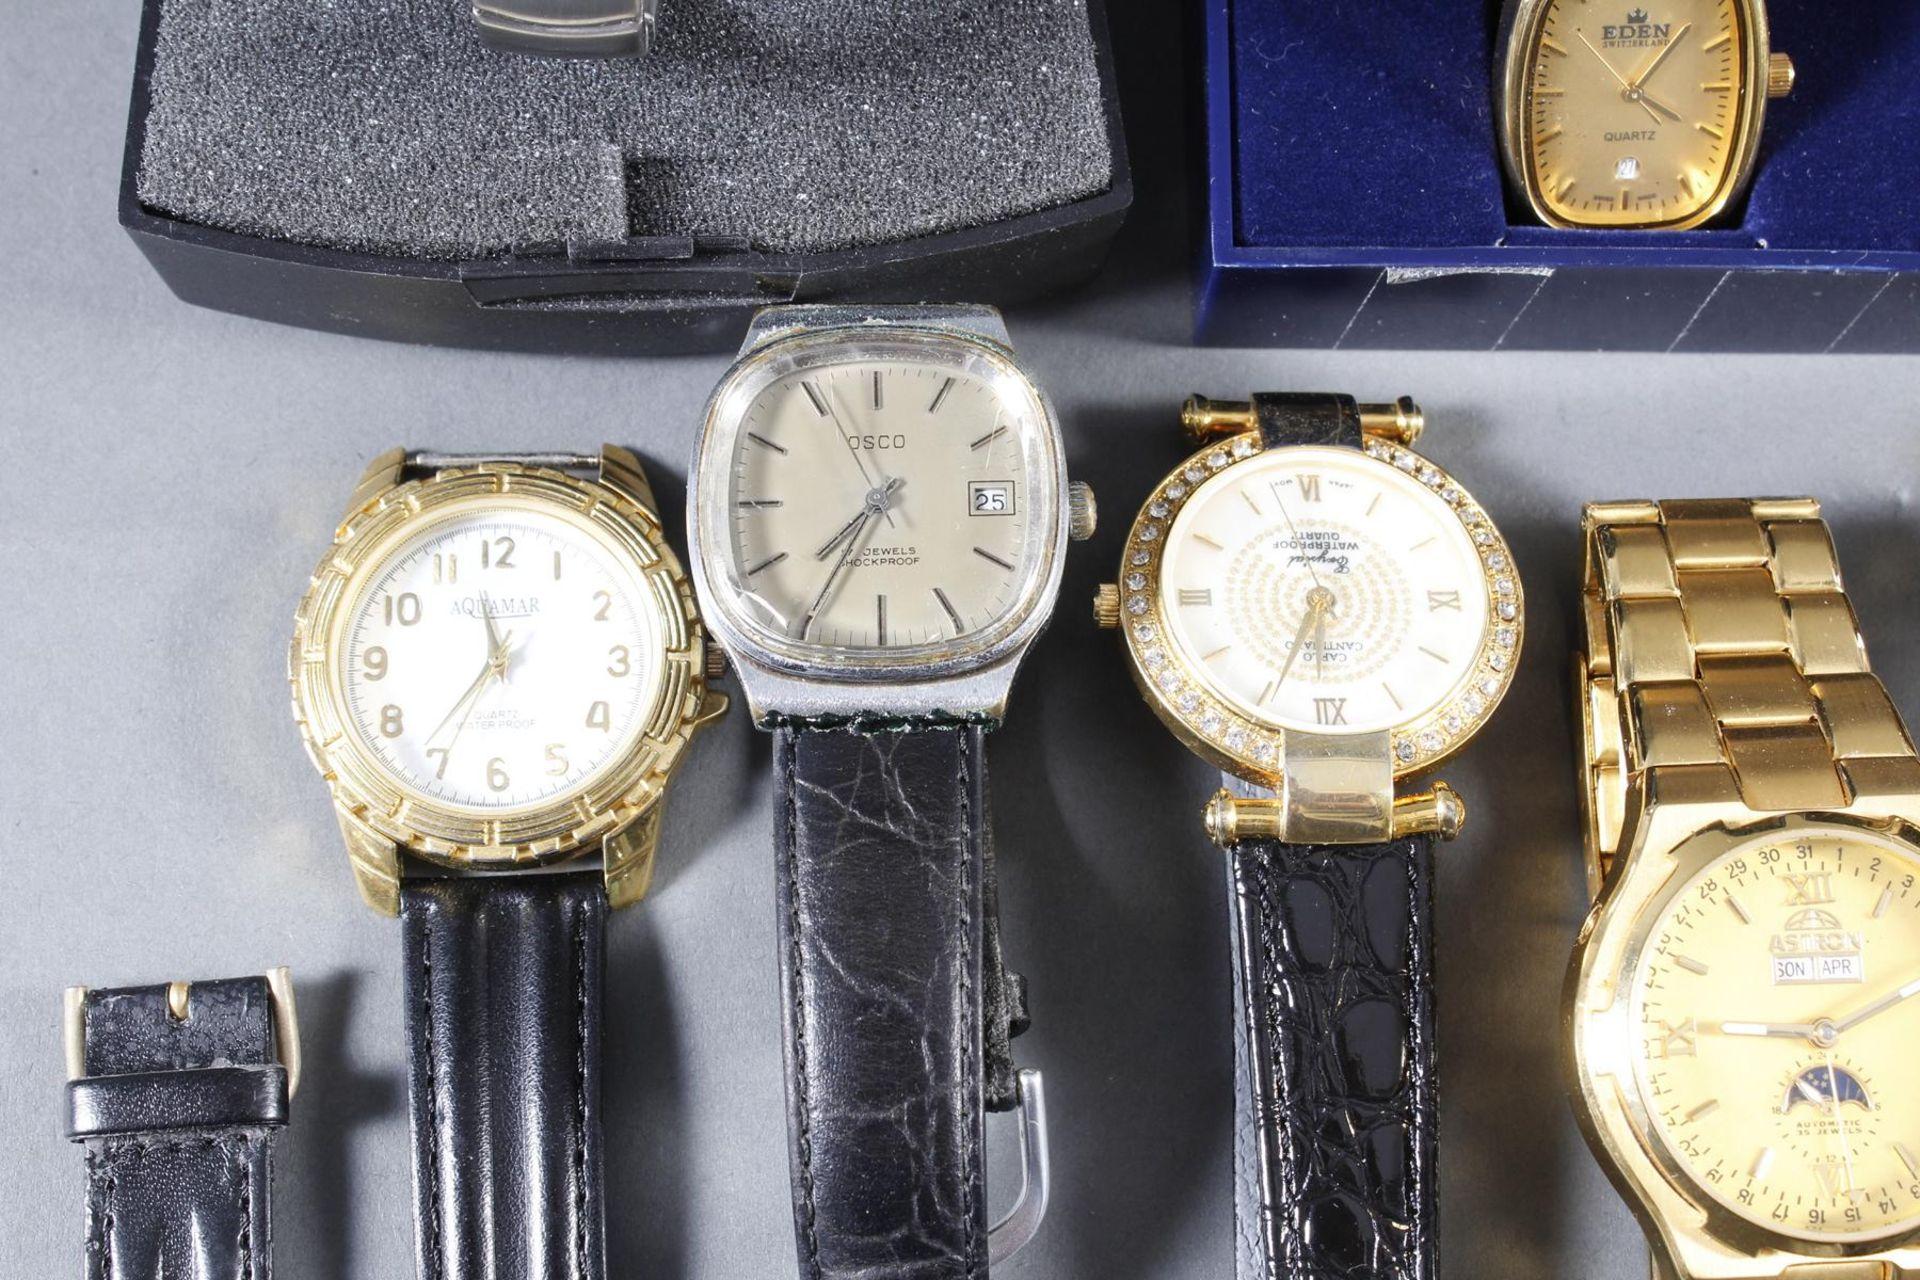 Konvolut Damen und Herrenarmbanduhren, 14 Stück - Bild 2 aus 7